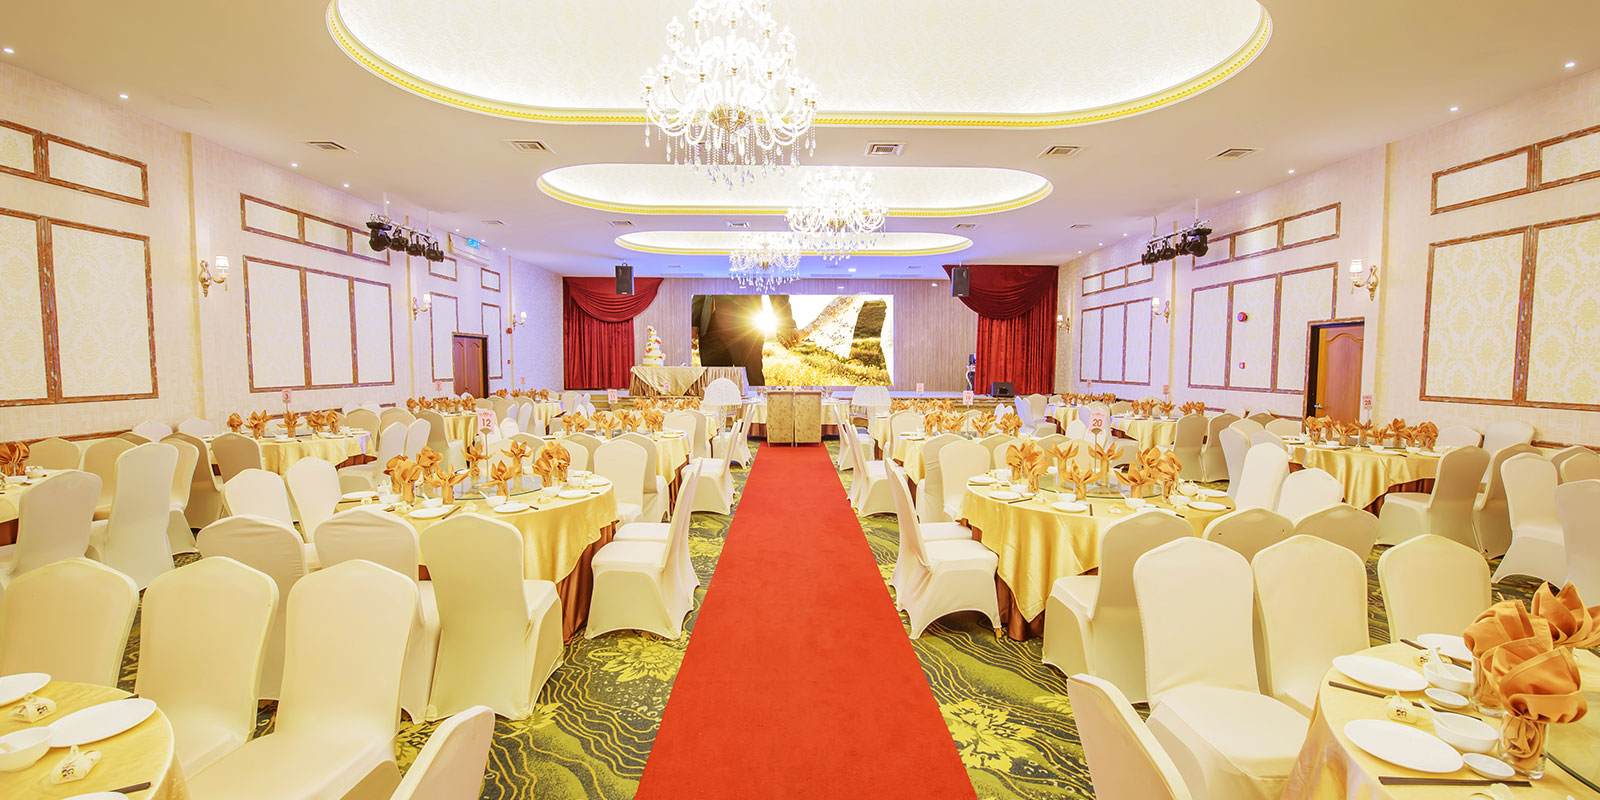 Wedding & Events - Unique Seafood PJ23 Restaurant - Unique